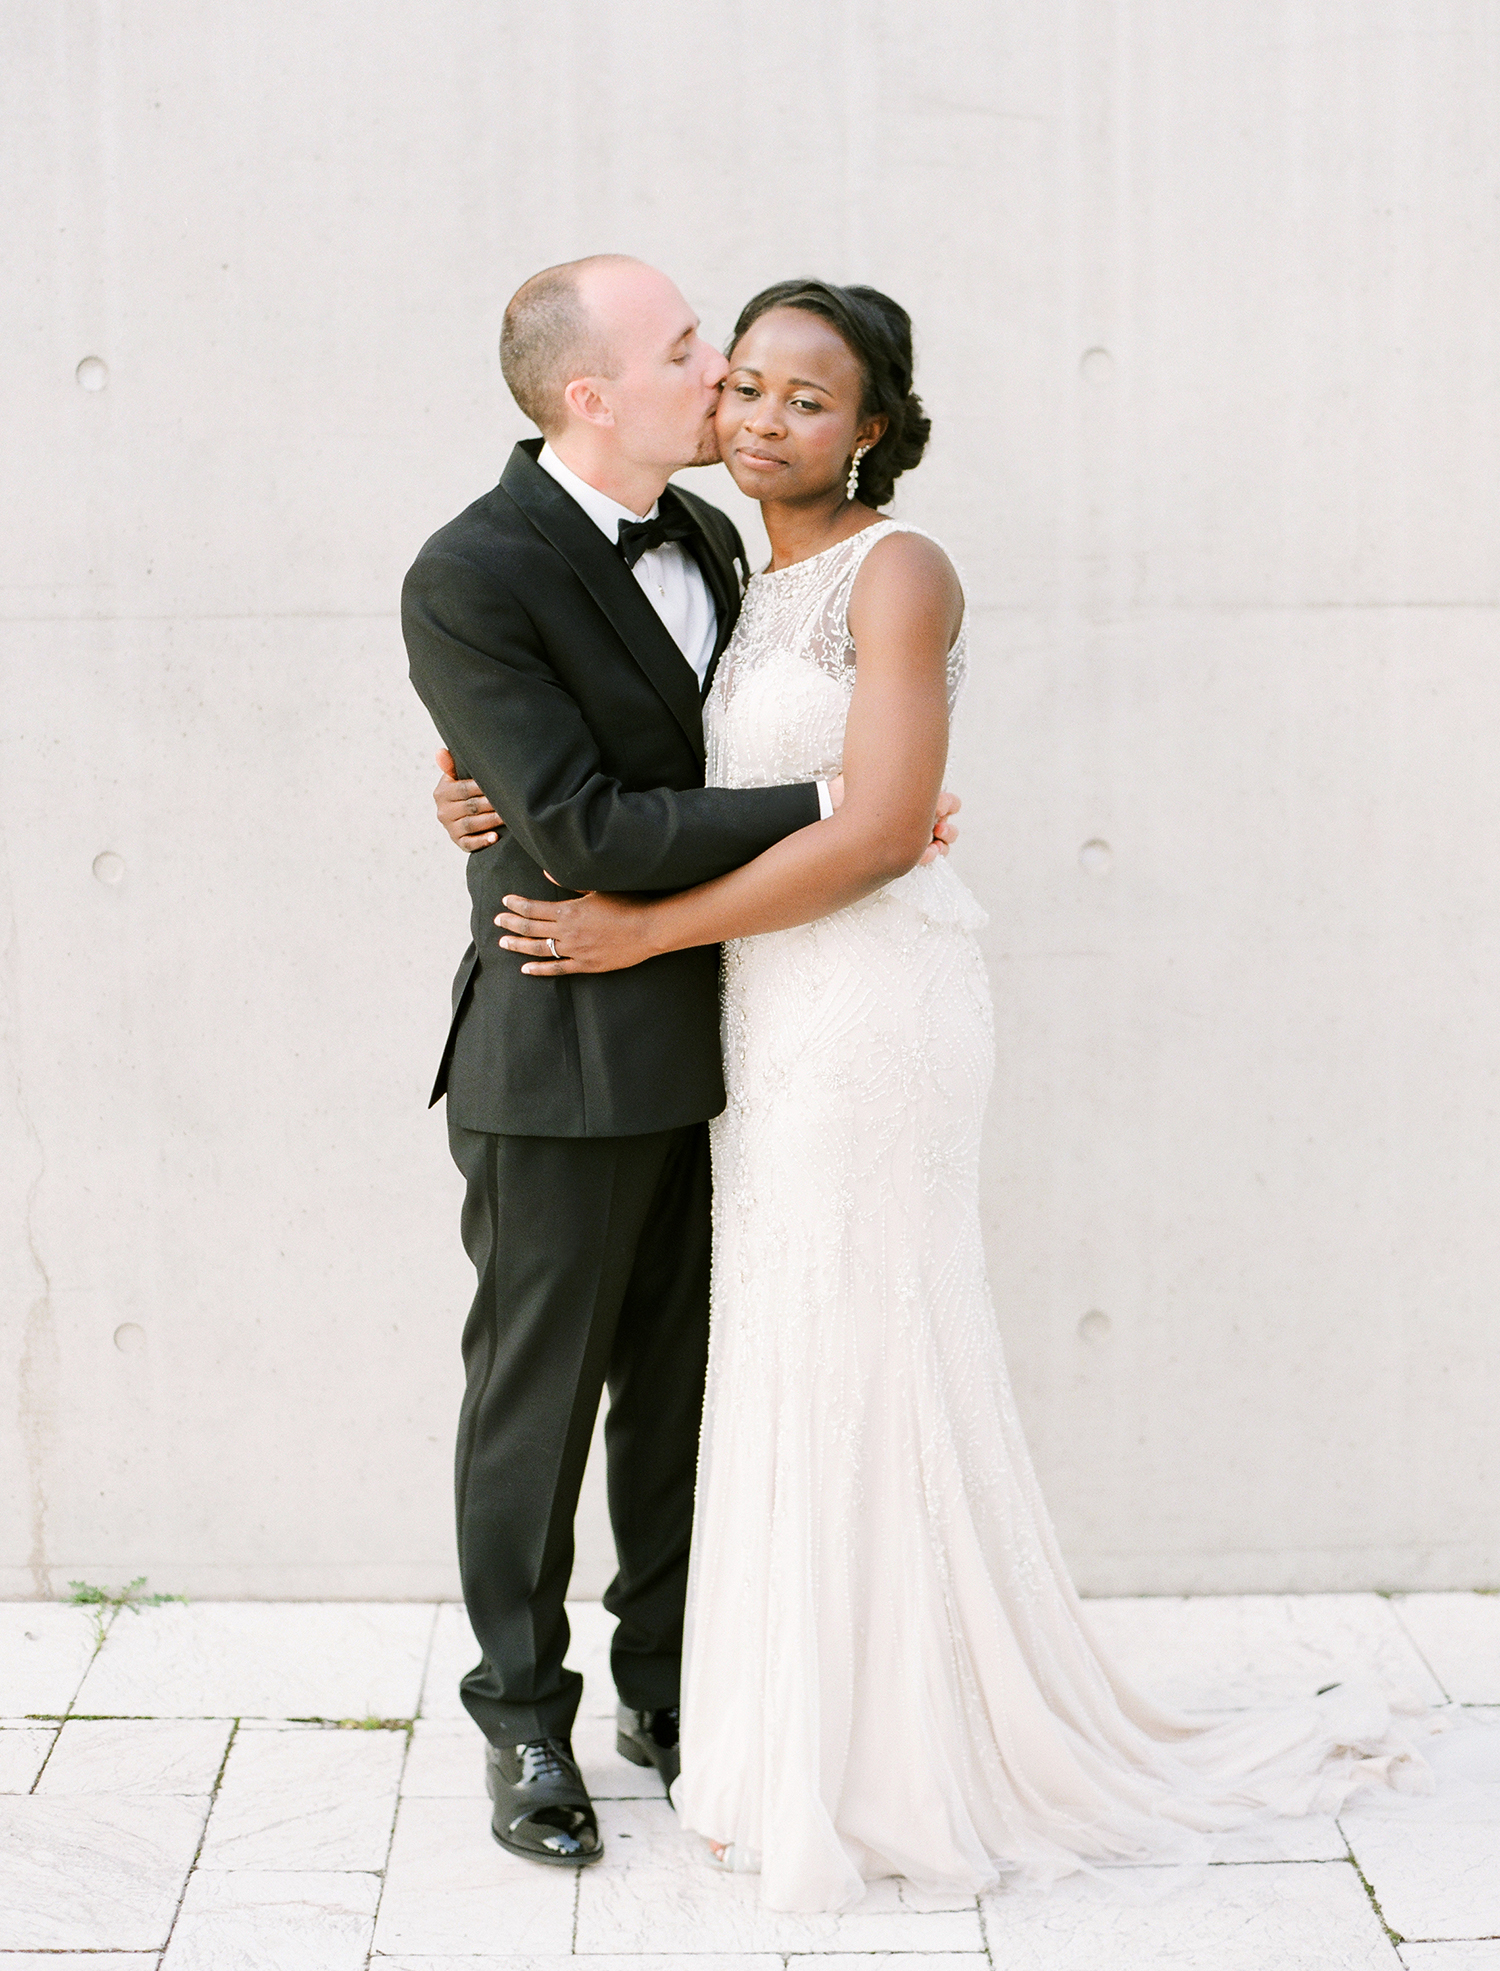 anwuli patrick wedding couple hugging in front of cream wall